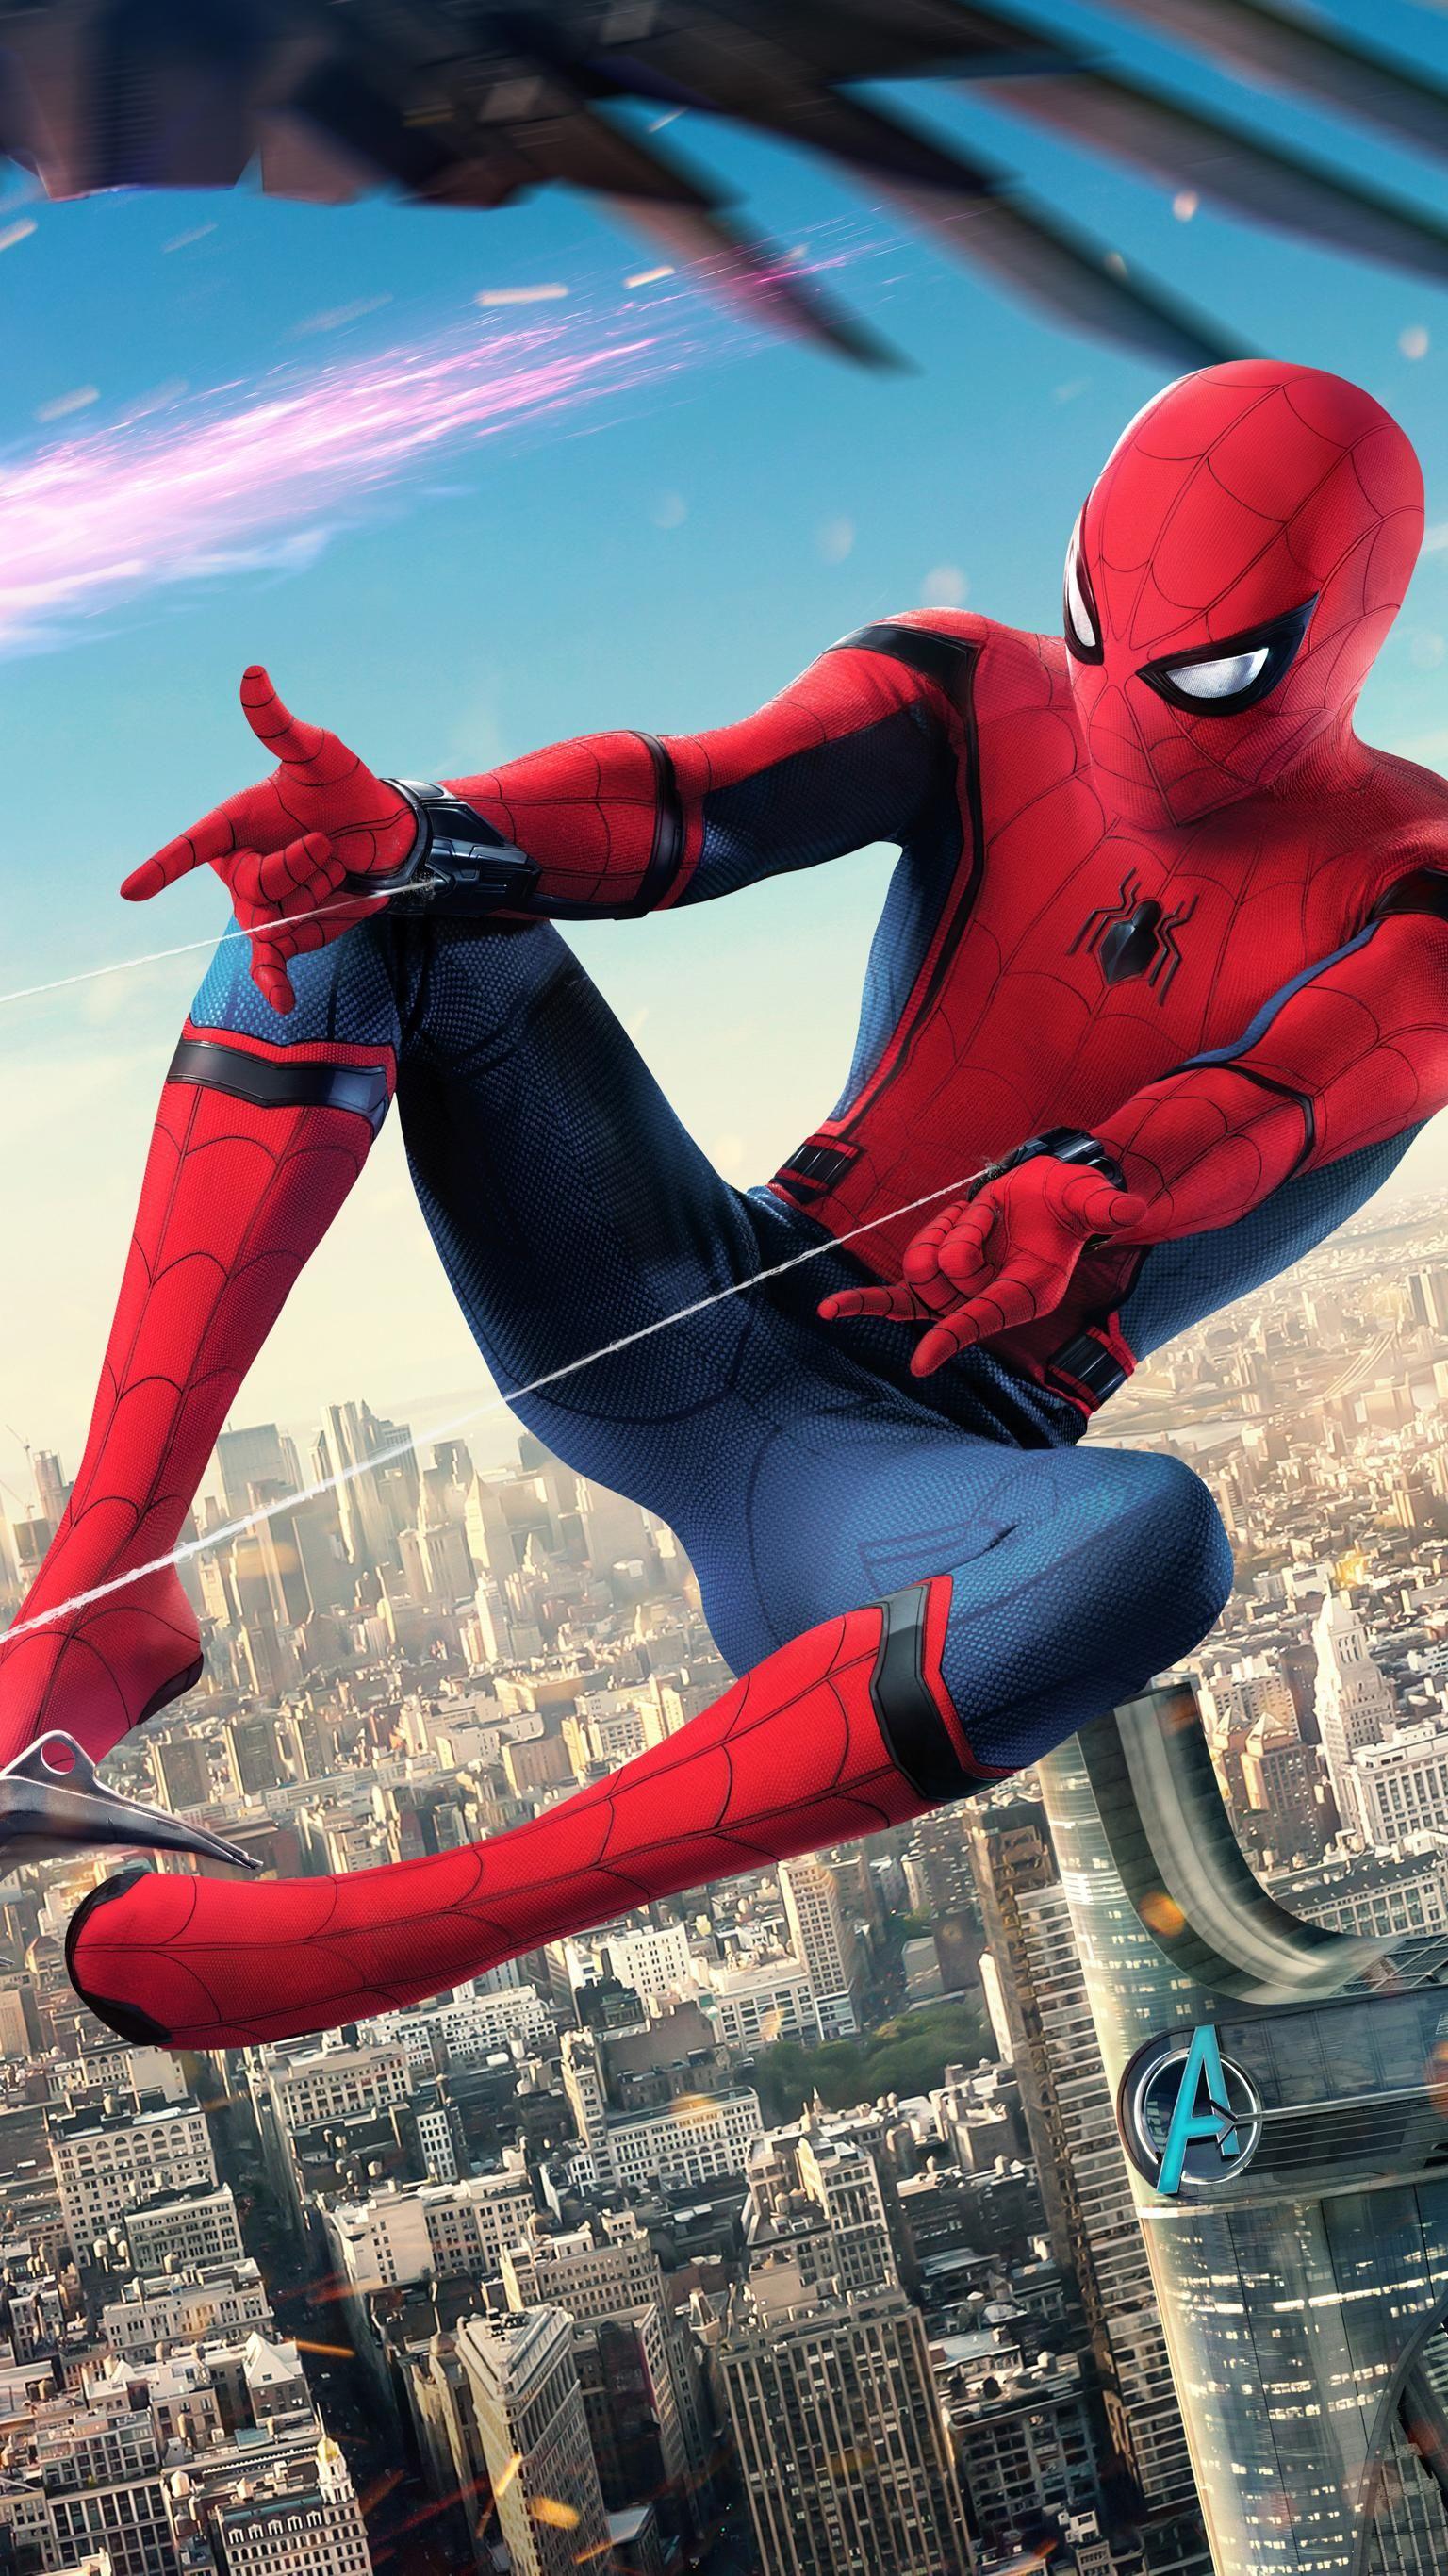 Spider Man Homecoming 2017 Phone Wallpaper Spider man 1536x2732